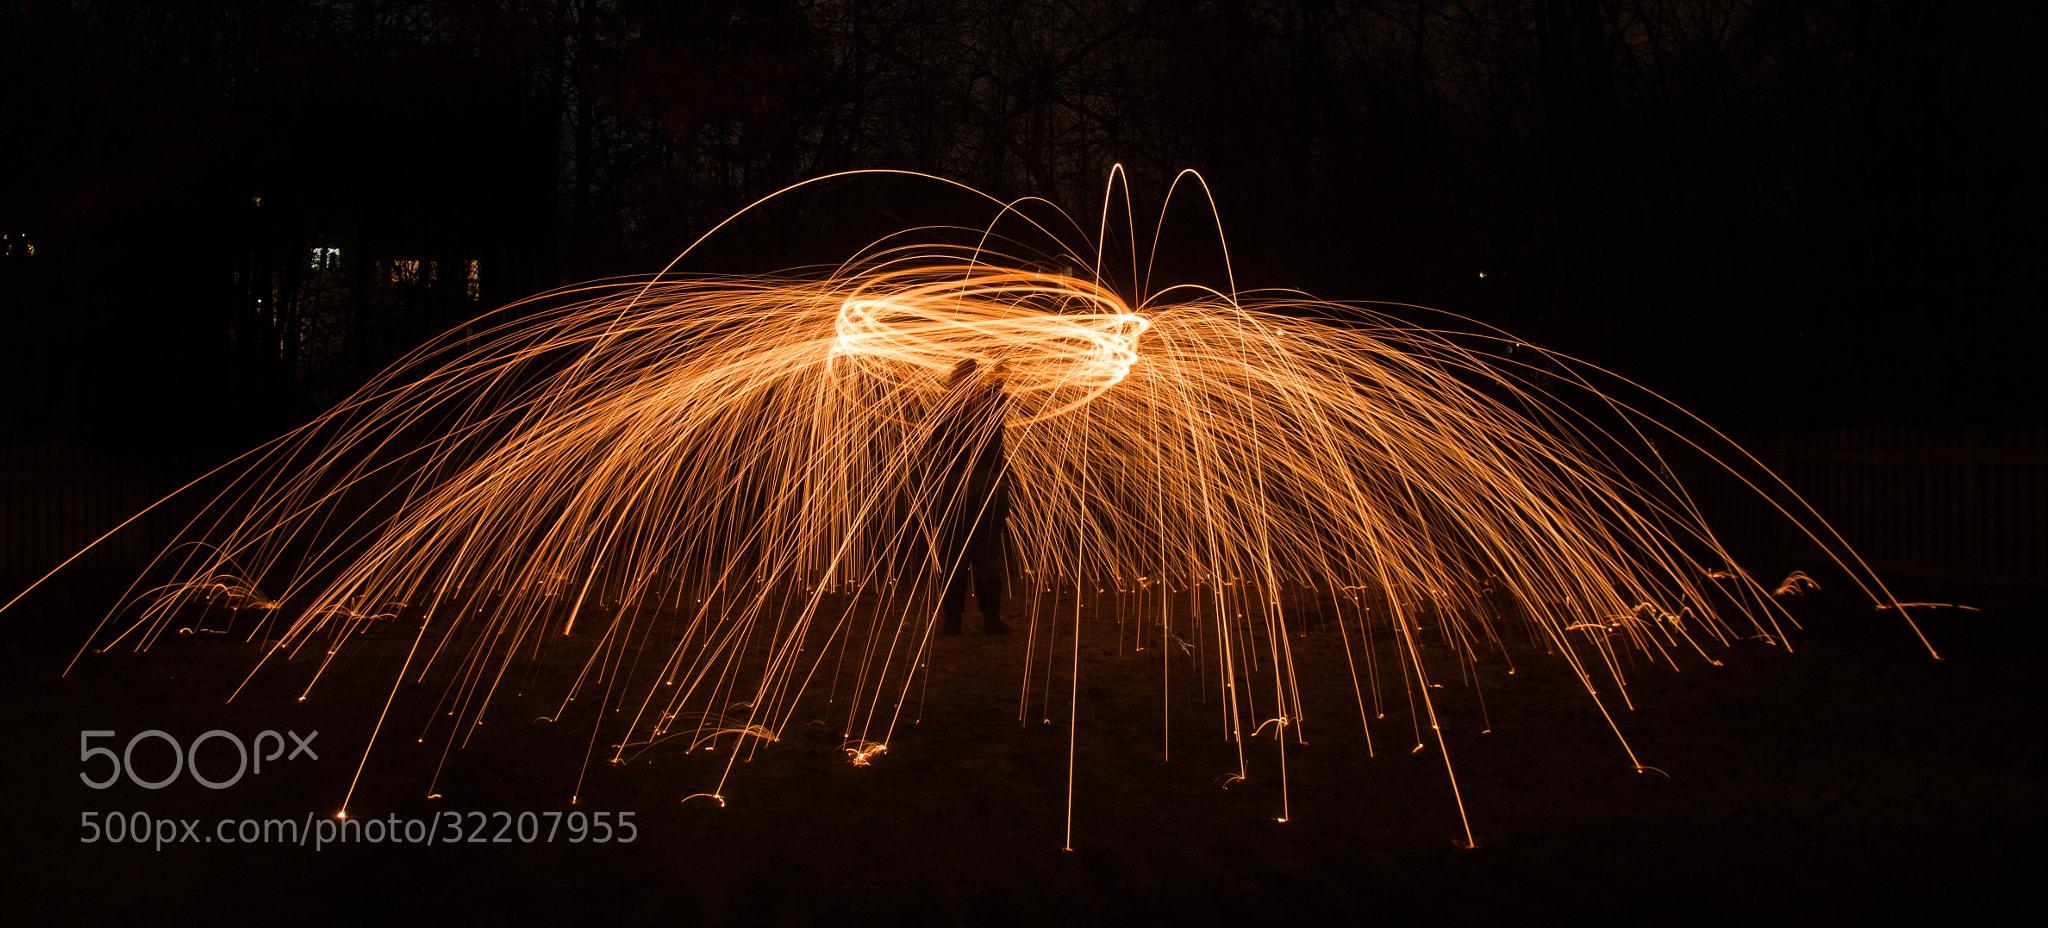 Photograph Firefly Dreams by Brad Denny on 500px